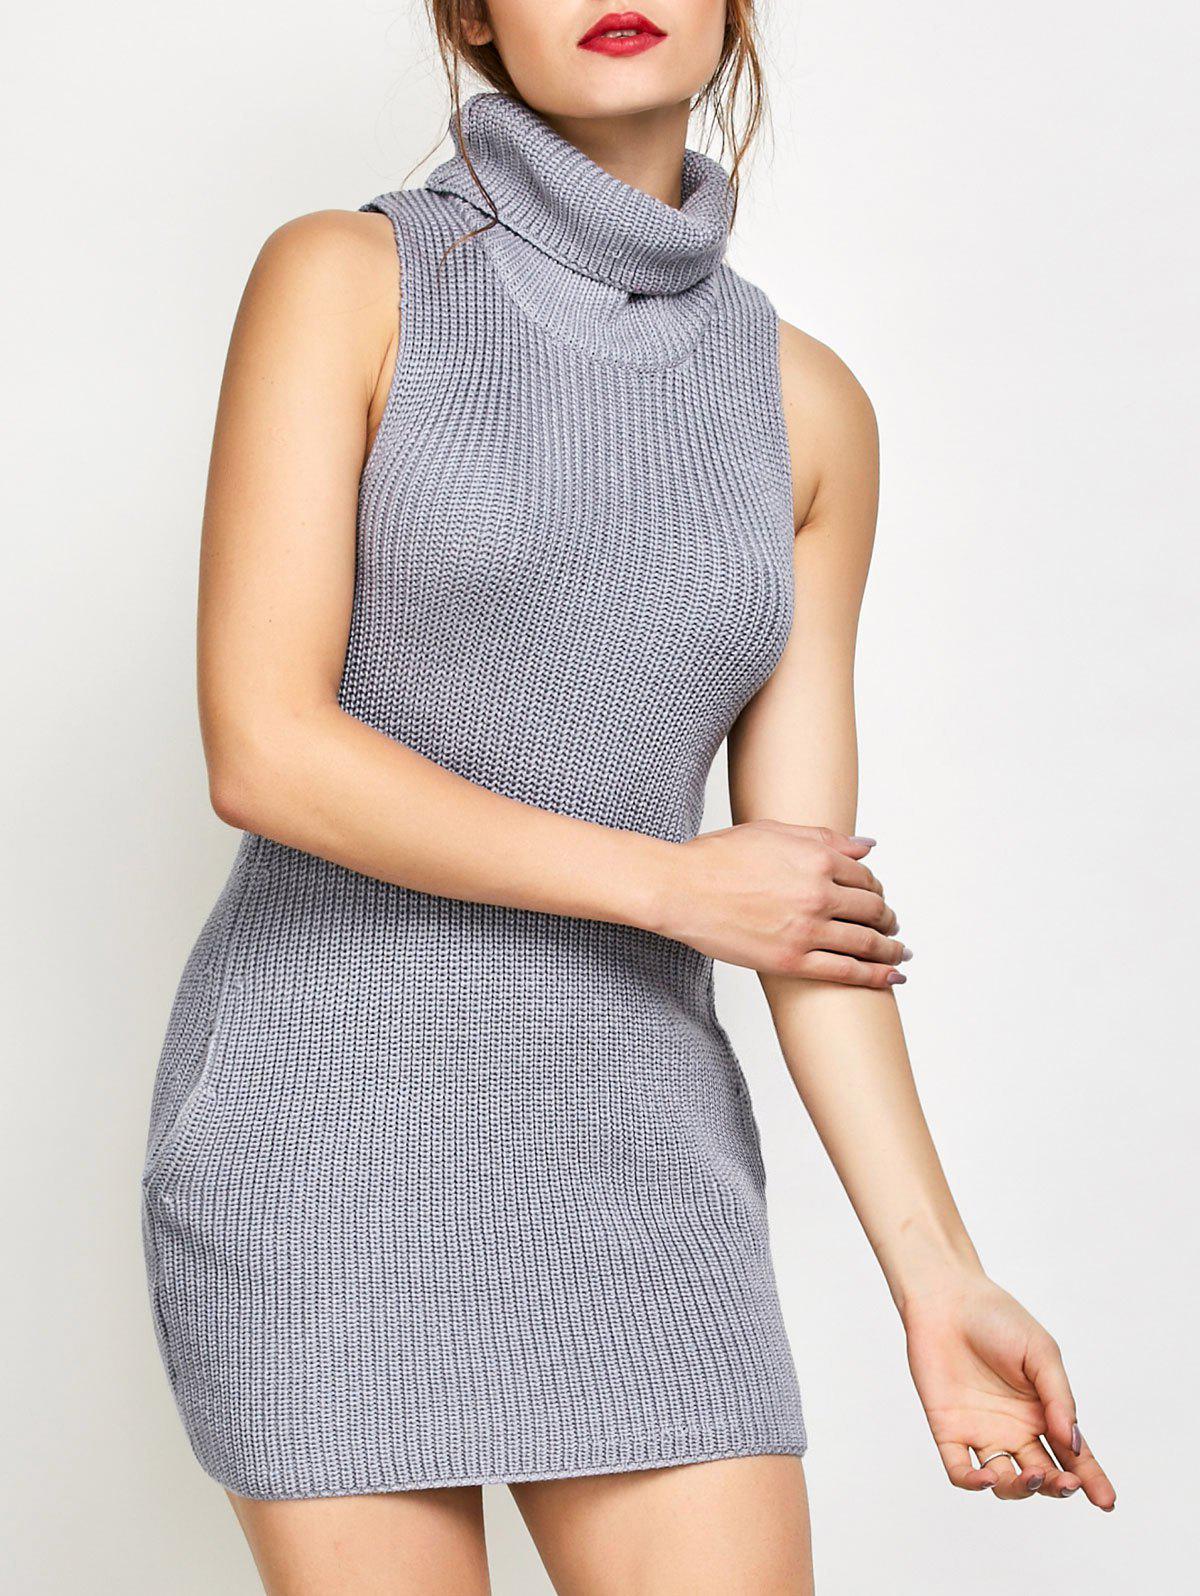 Sleeveless Turtle Neck Sweater Dress 204099103